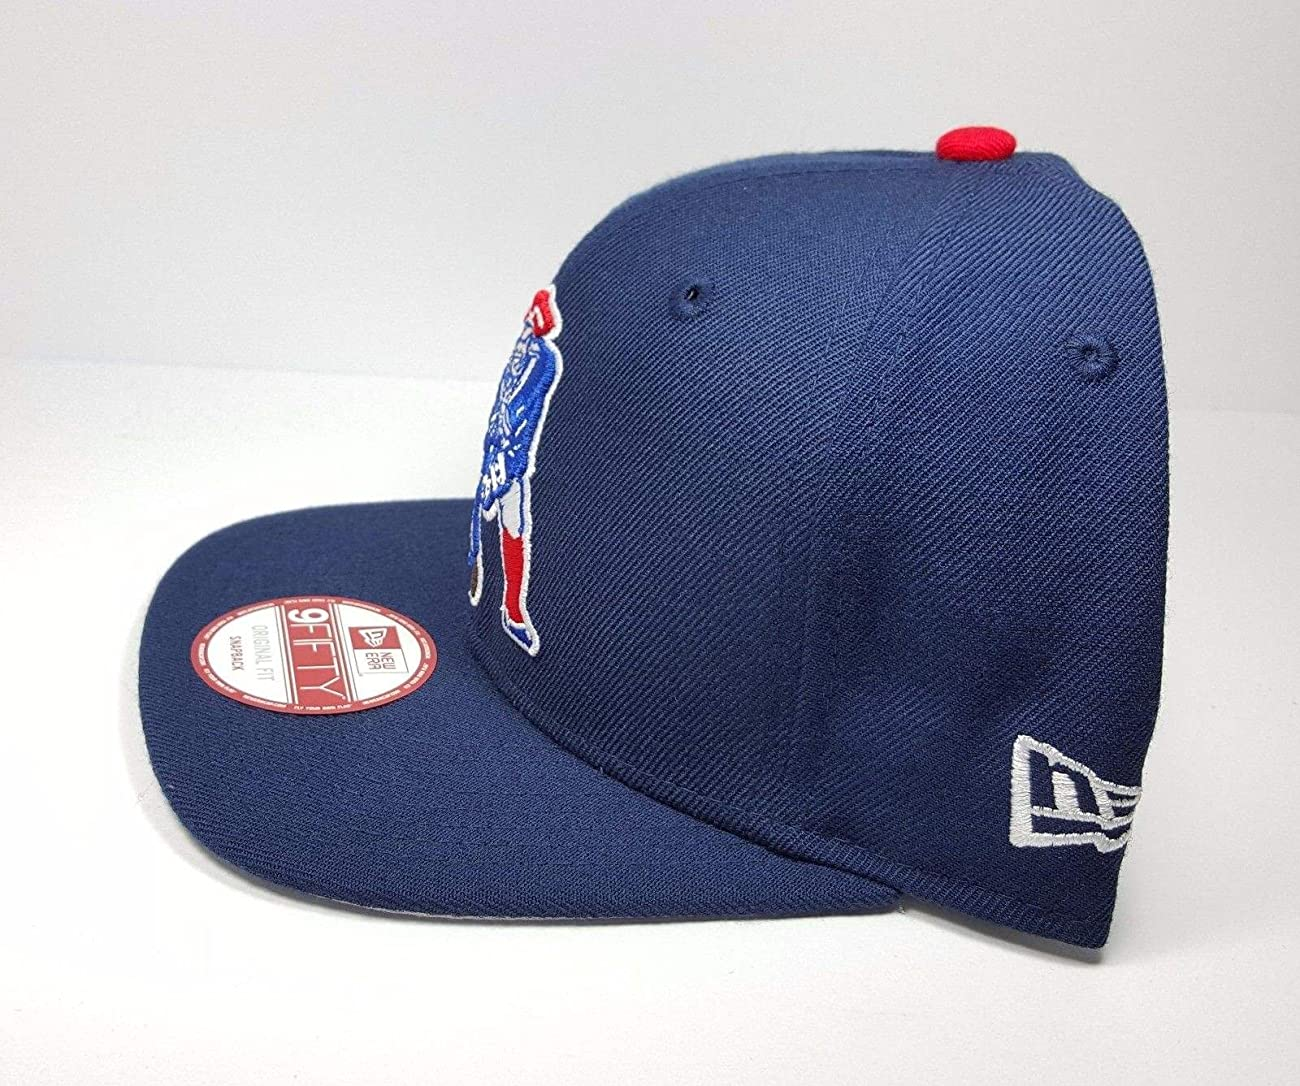 New Era New England Patriots 9Fifty Vintage Throwback Navy Blue Logo Adjustable Snapback Hat NFL 1